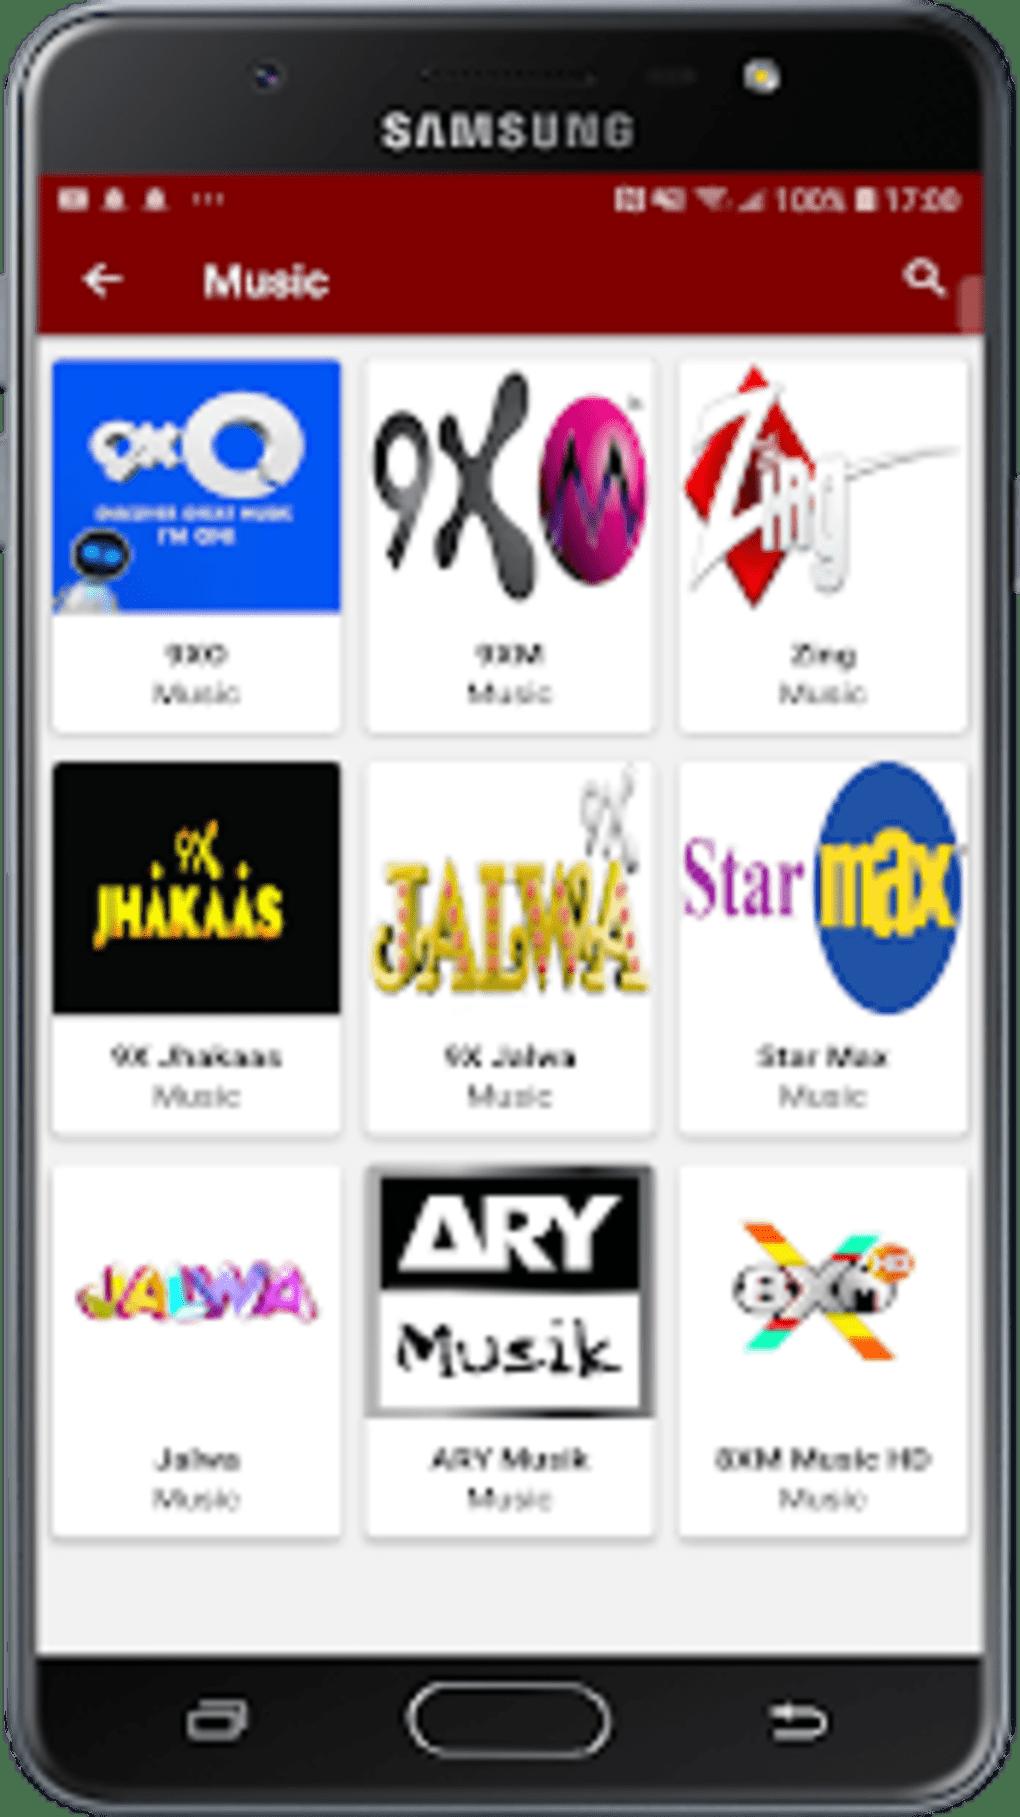 Pak Live Tv: Live TV News PTV Sports GEO Super for Android